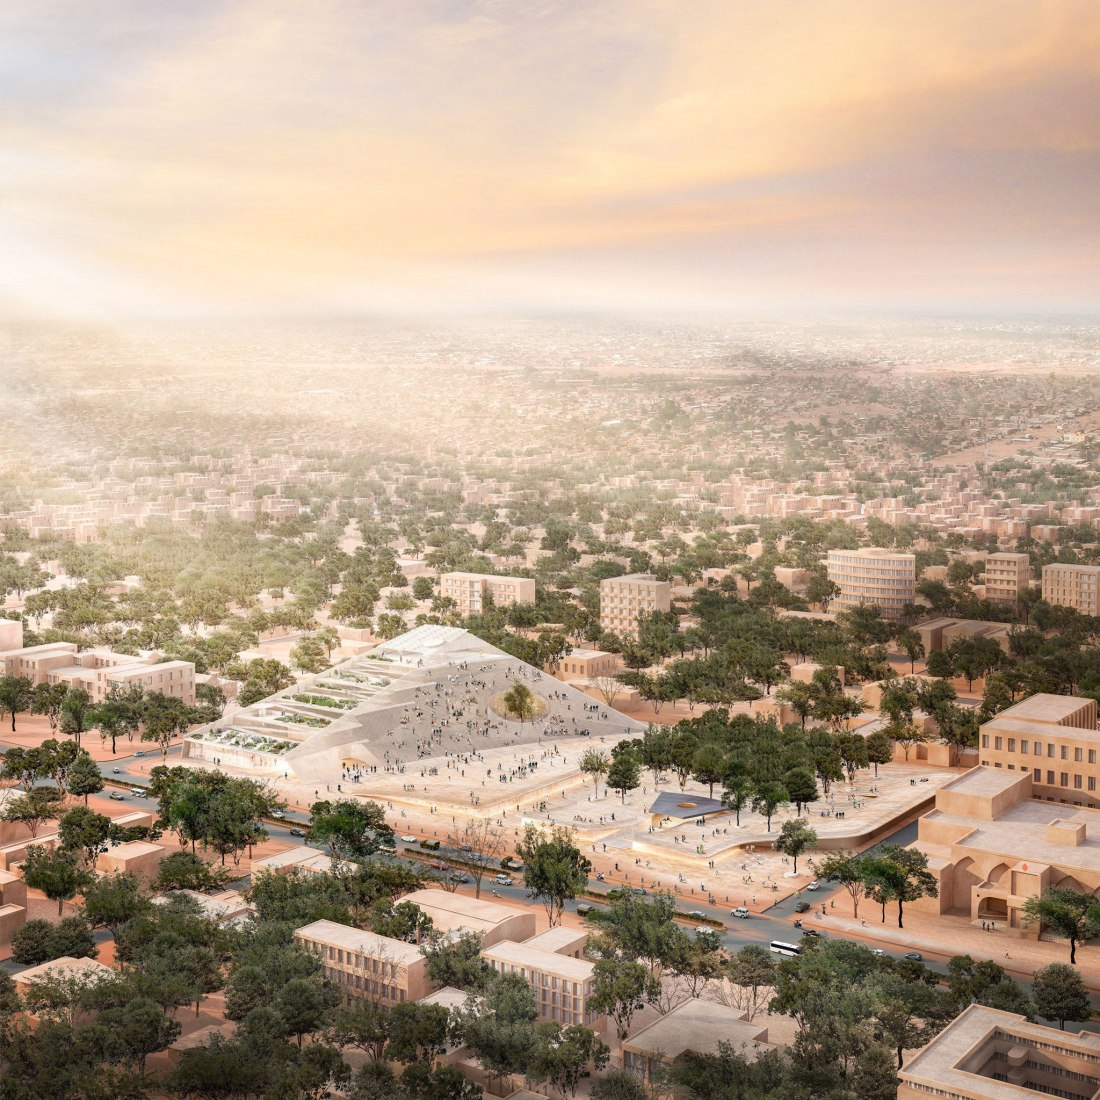 Overview rendering. Burkina Faso National Assembly & Memorial Park by Diébédo Francis Kéré. Image courtesy of Kéré Architecture